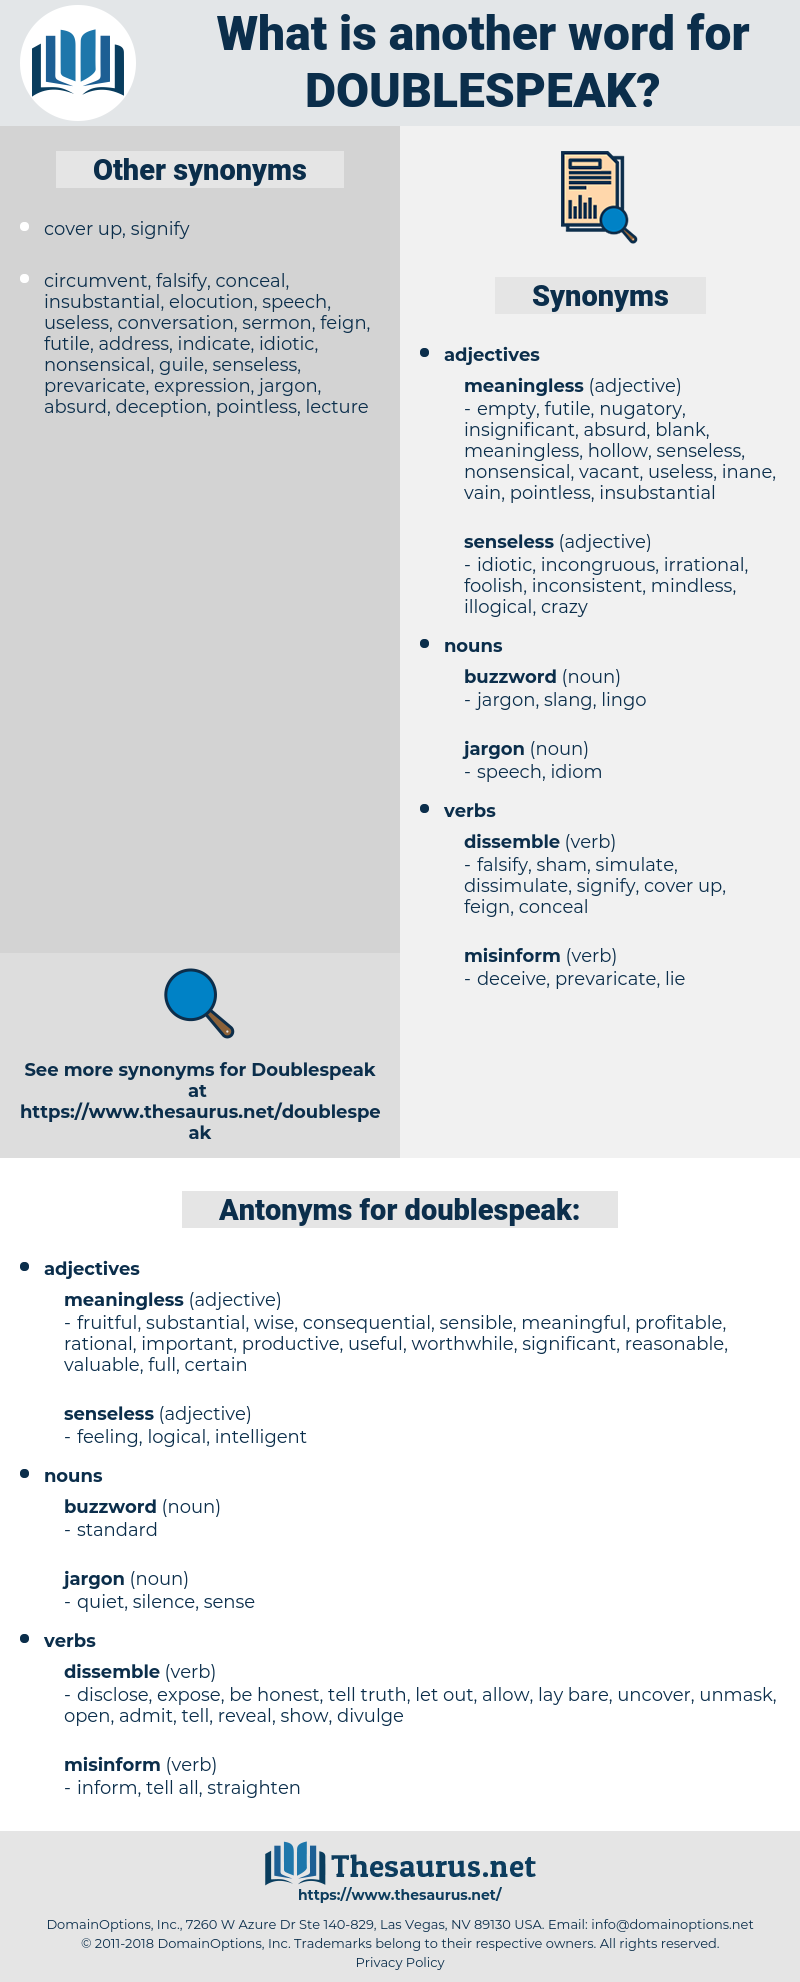 doublespeak, synonym doublespeak, another word for doublespeak, words like doublespeak, thesaurus doublespeak